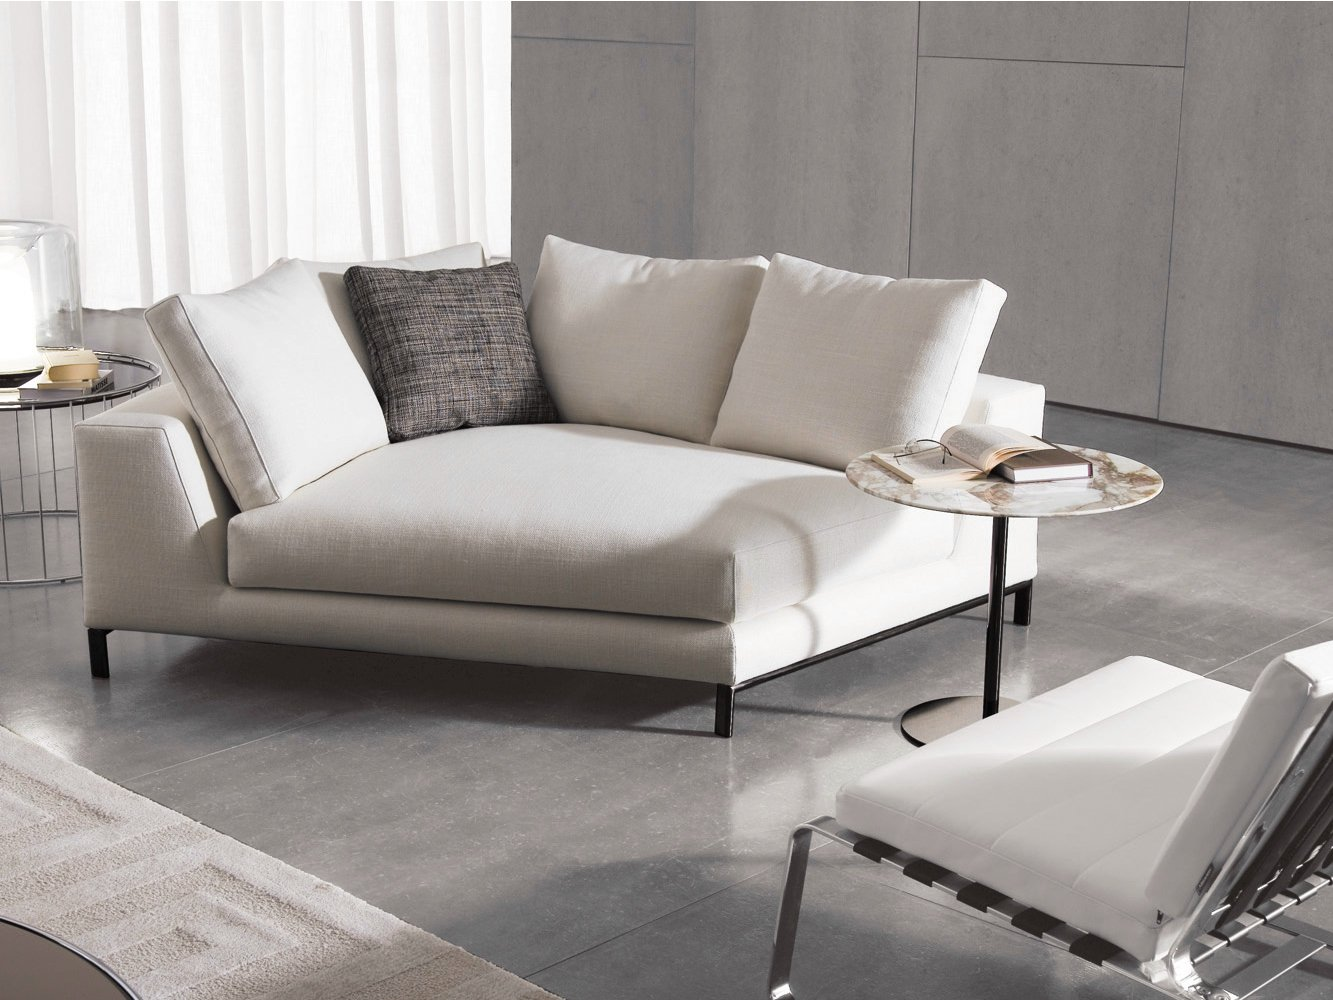 hamilton islands by minotti. Black Bedroom Furniture Sets. Home Design Ideas